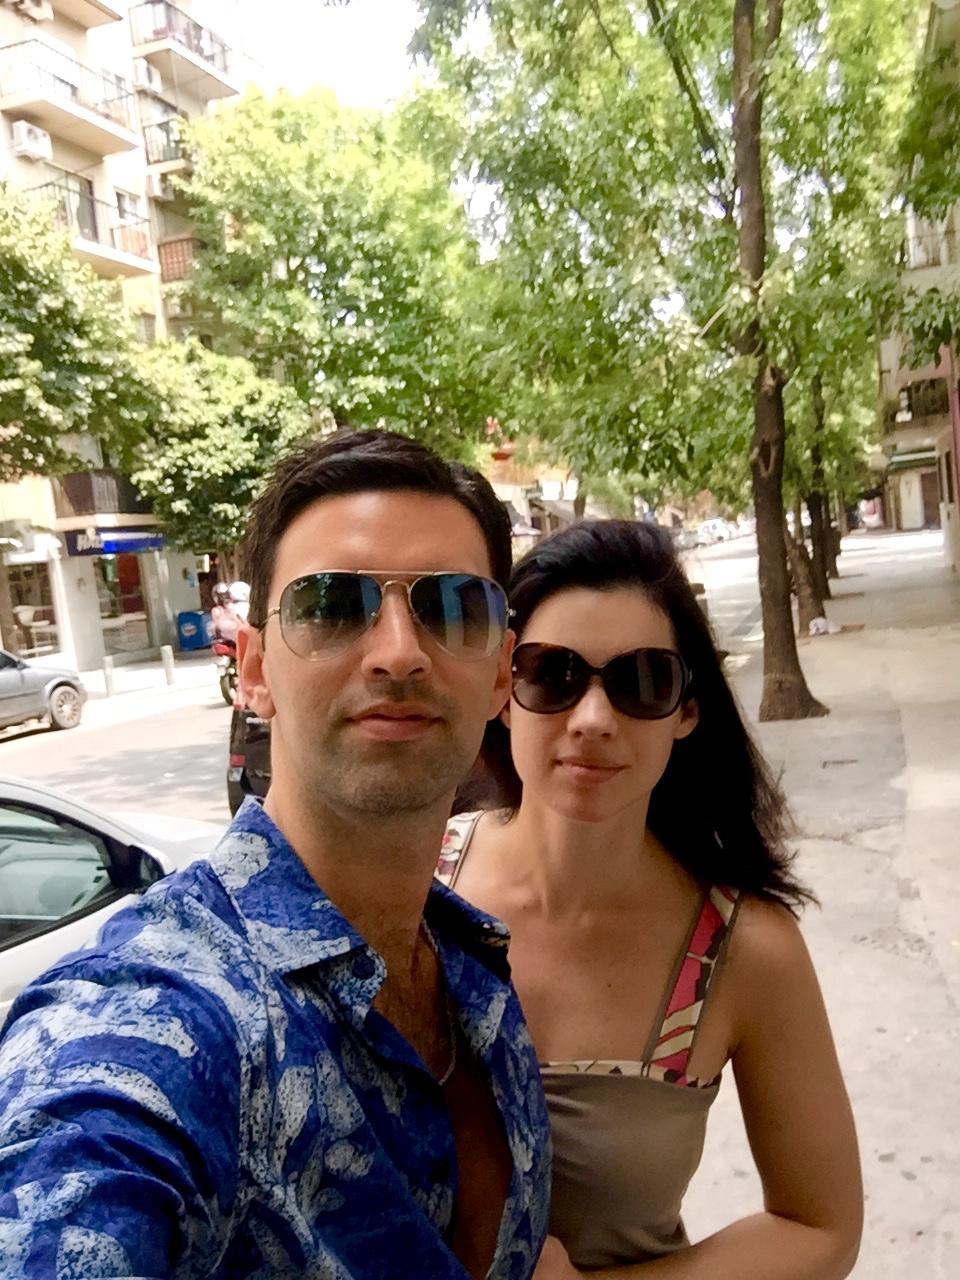 Sommernachmittag in Palermo